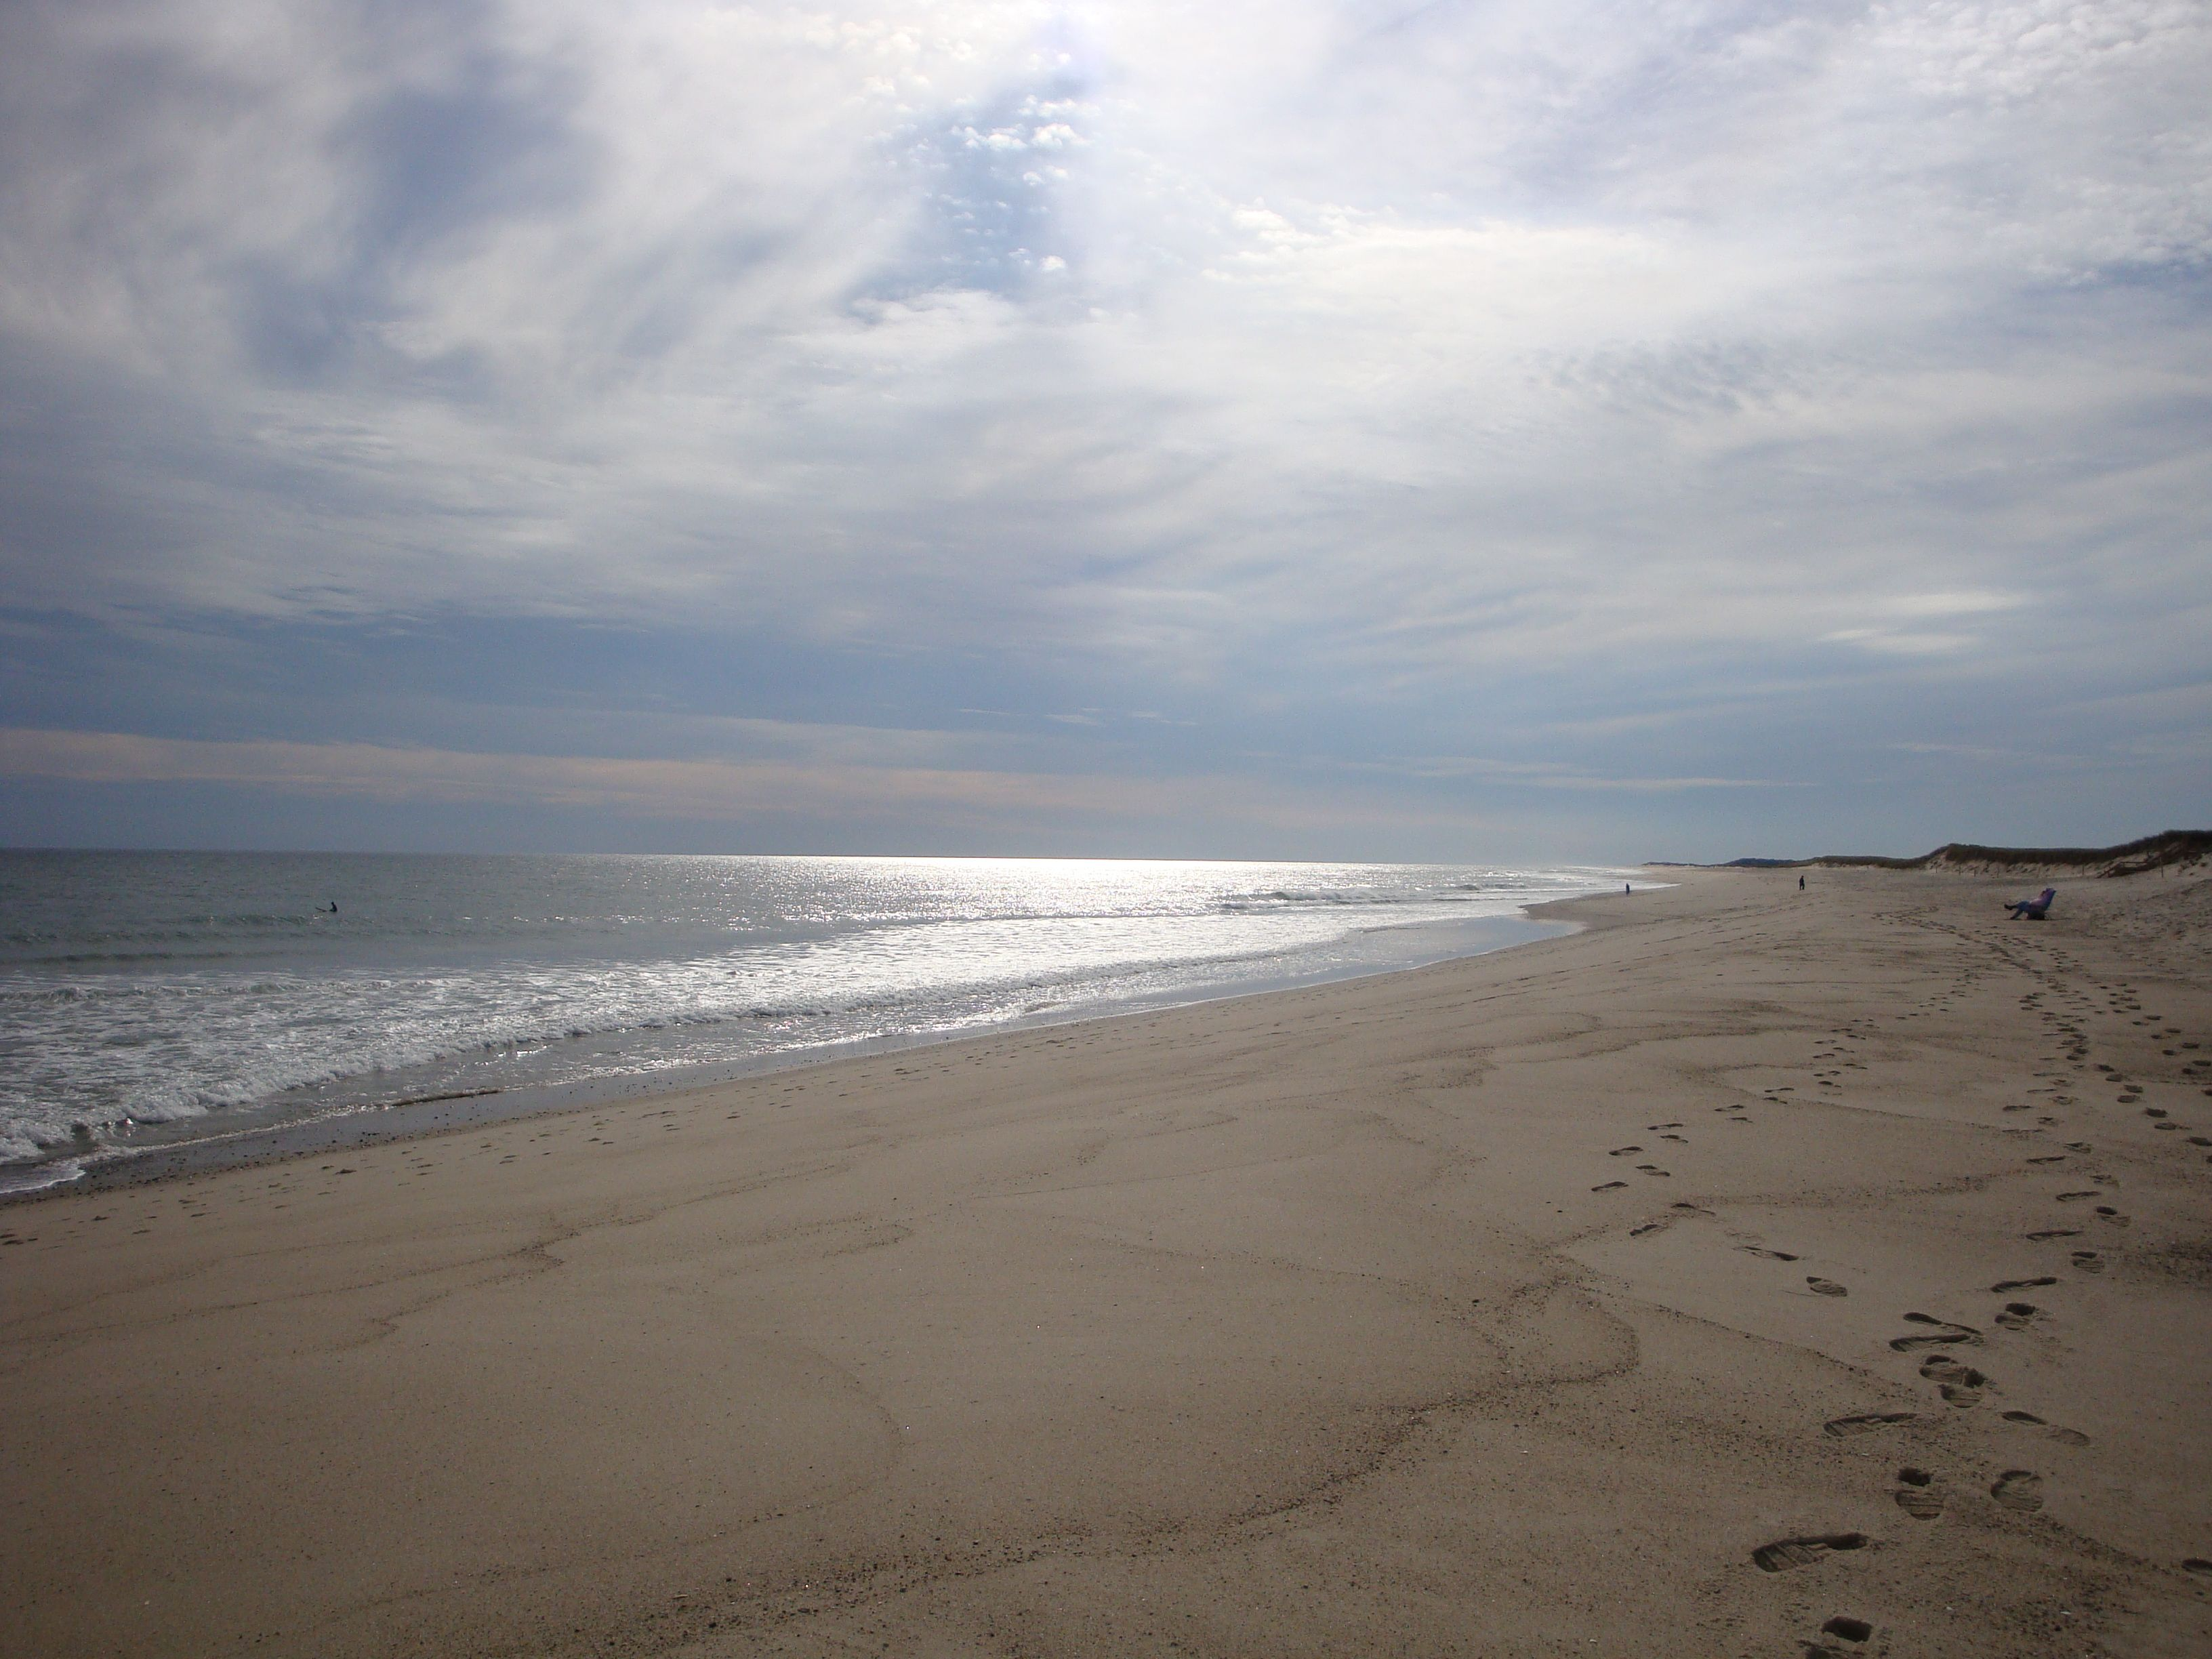 Nauset Beach Cape Cod, Ma Beautiful Place Happy Memories